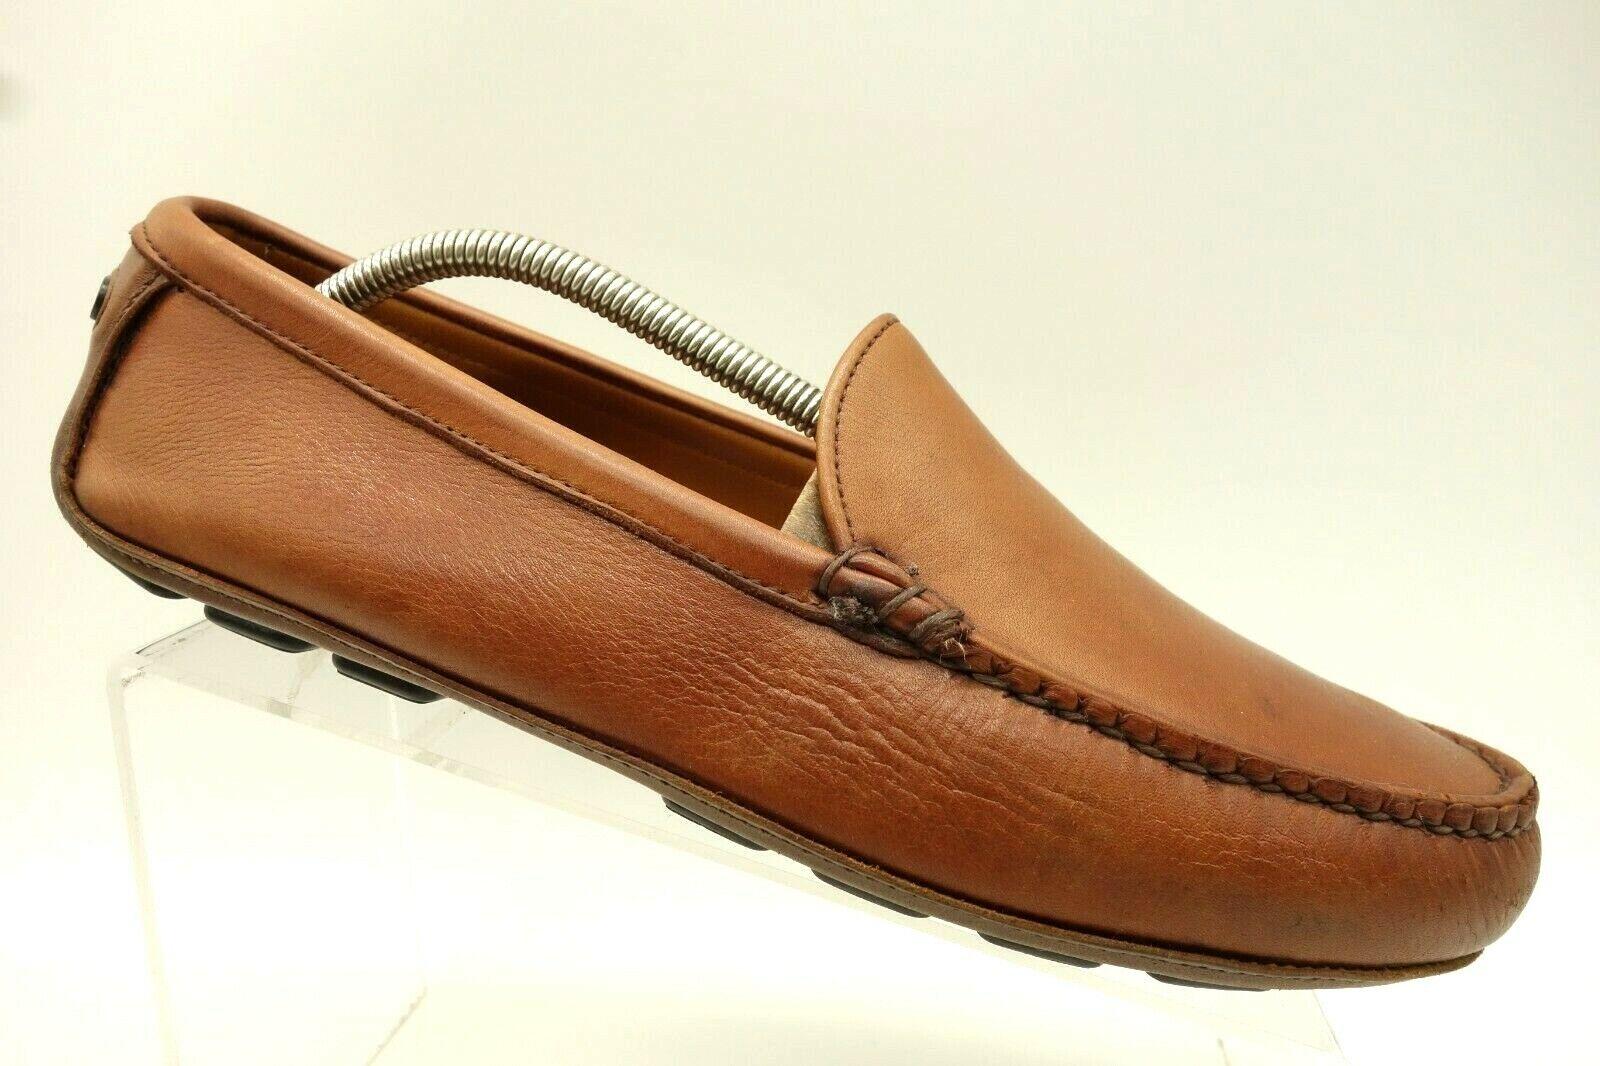 Allen Edmonds Castine USA Brown Leather Casual Driving Loafers Men's 10 D